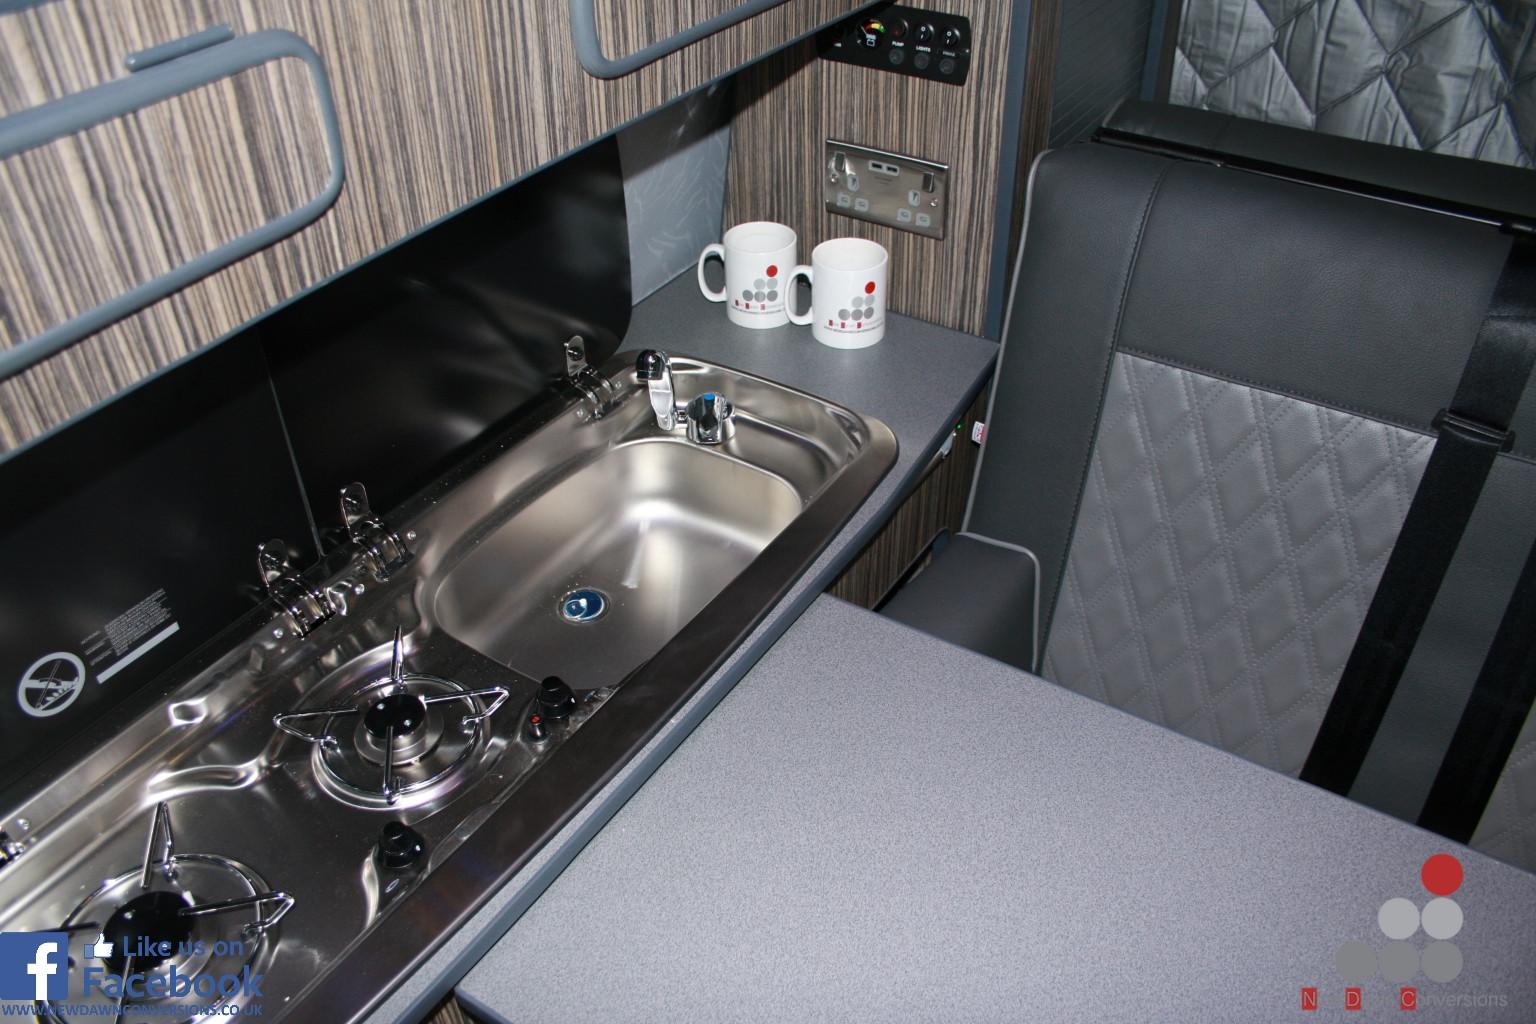 Mazda Bongo side camper conversionMazda Bongo side camper conversion